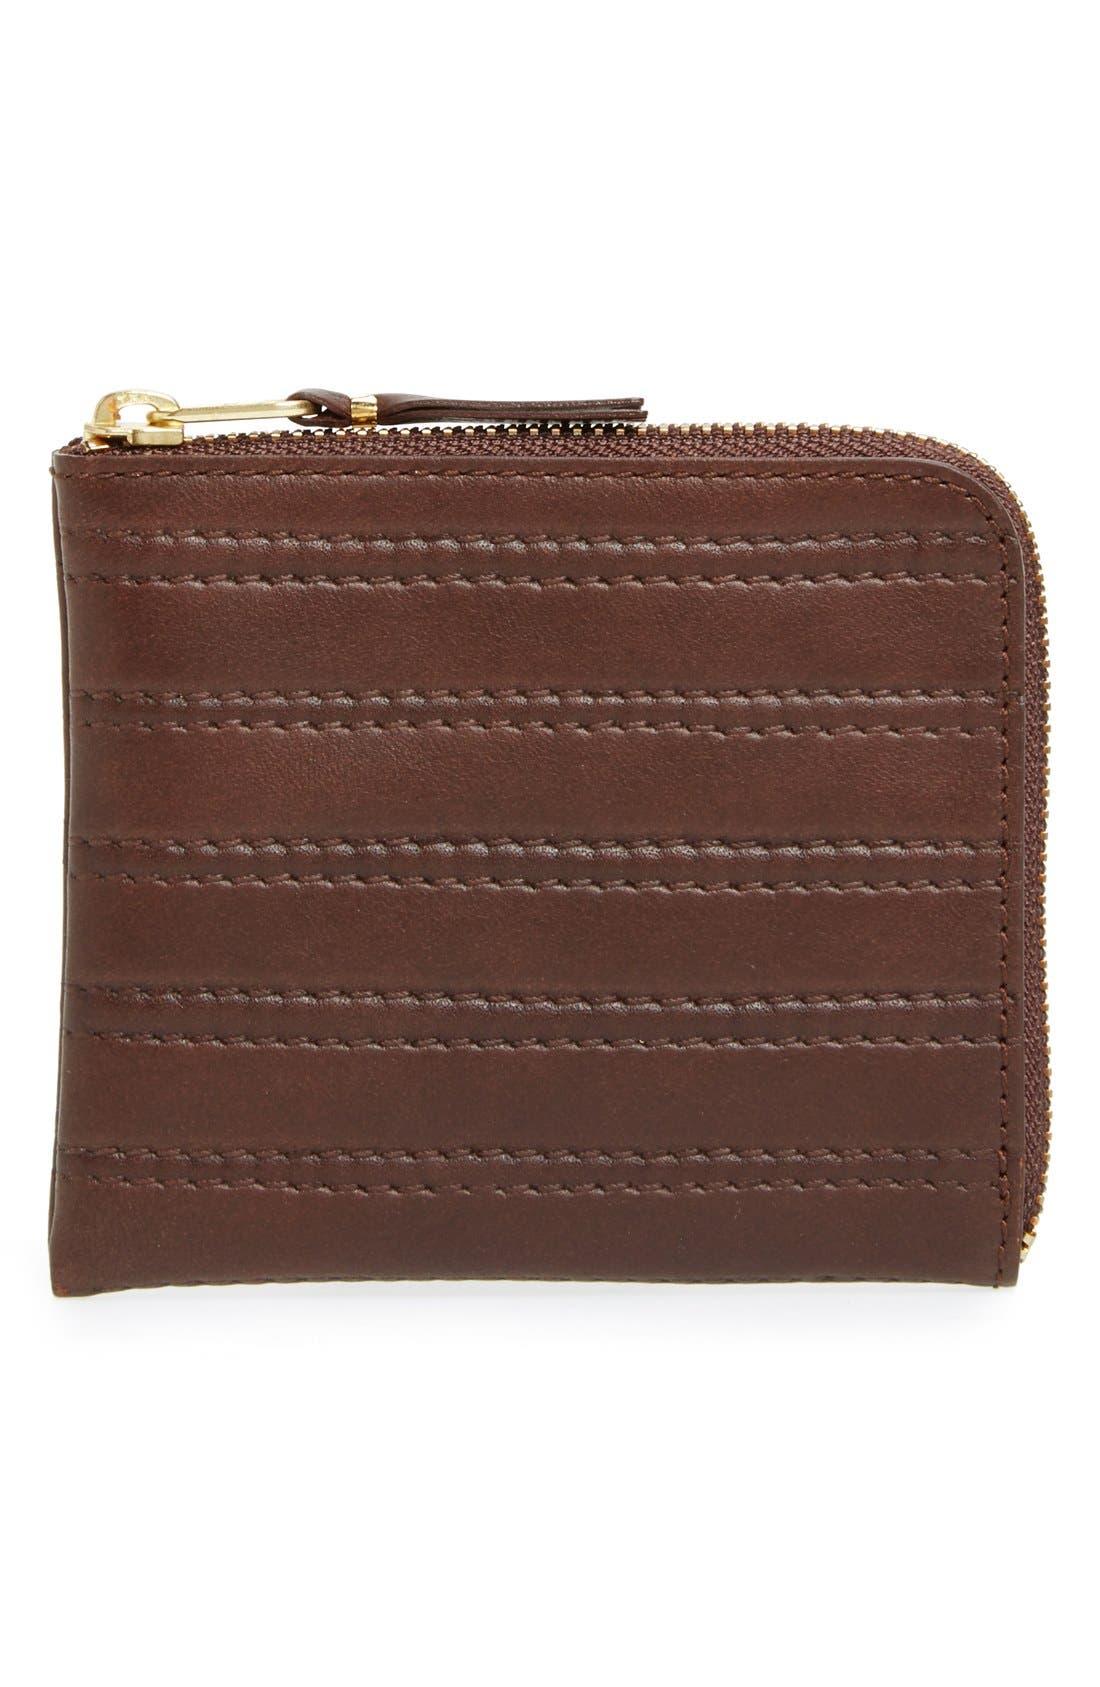 COMME DES GARÇONS 'Embossed Stitch' Leather Half Zip